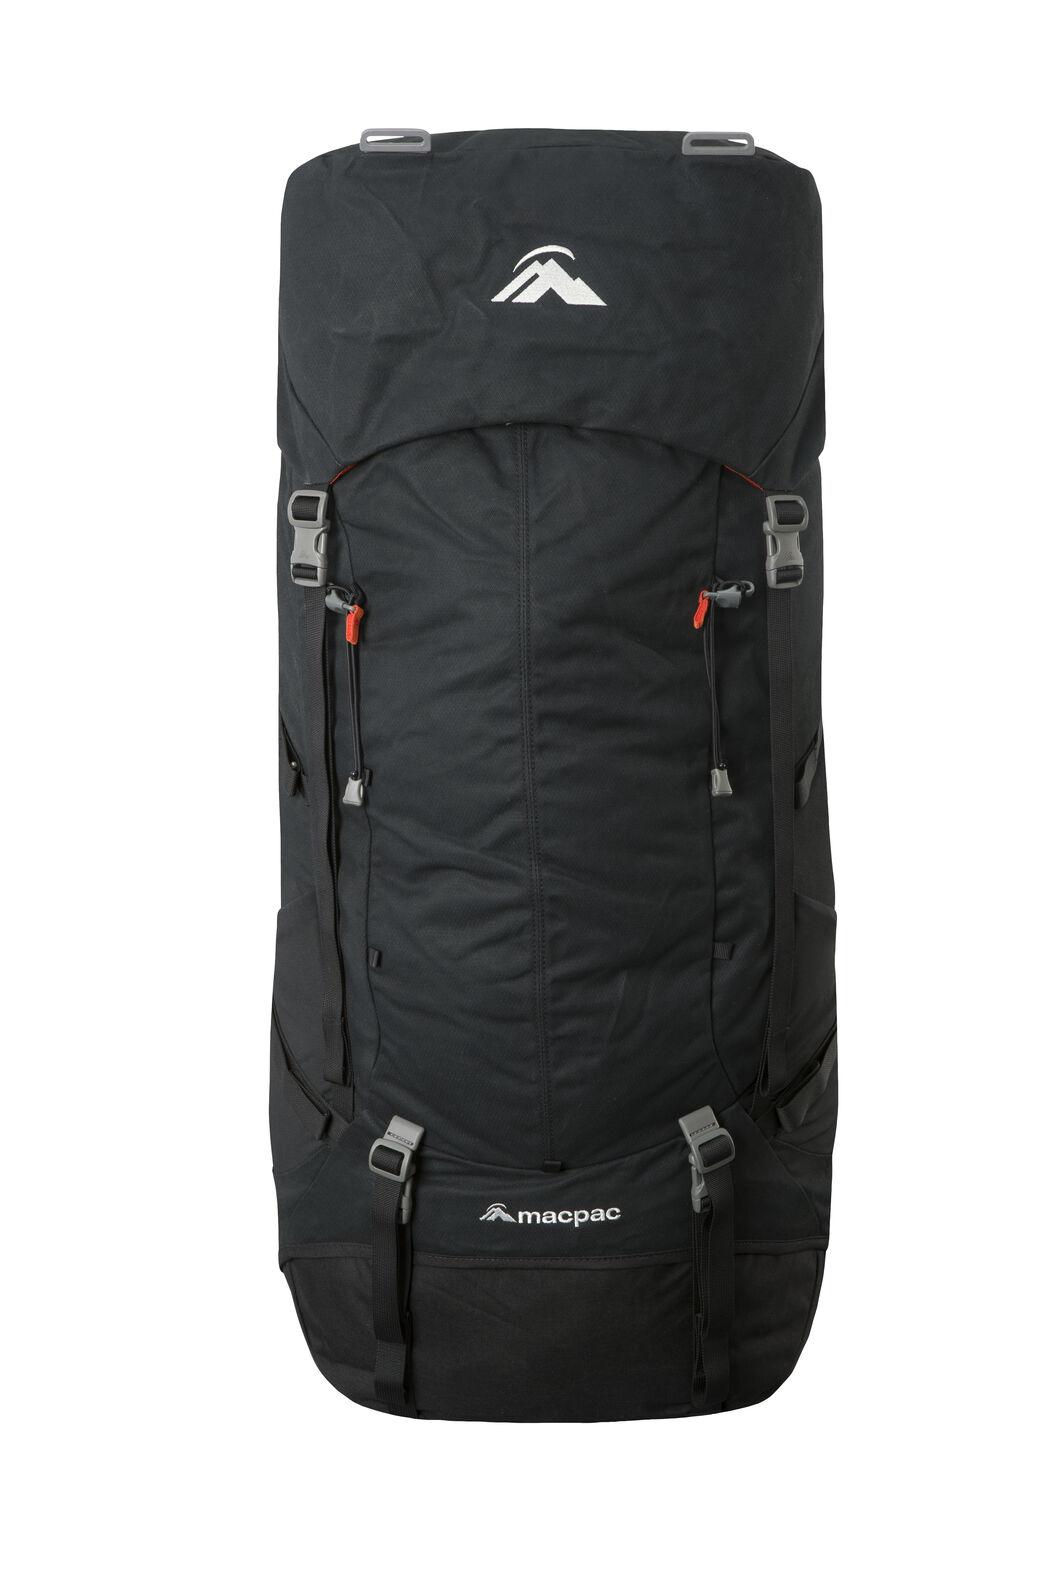 Macpac Cascade 75L AzTec® Hiking Pack, Black, hi-res